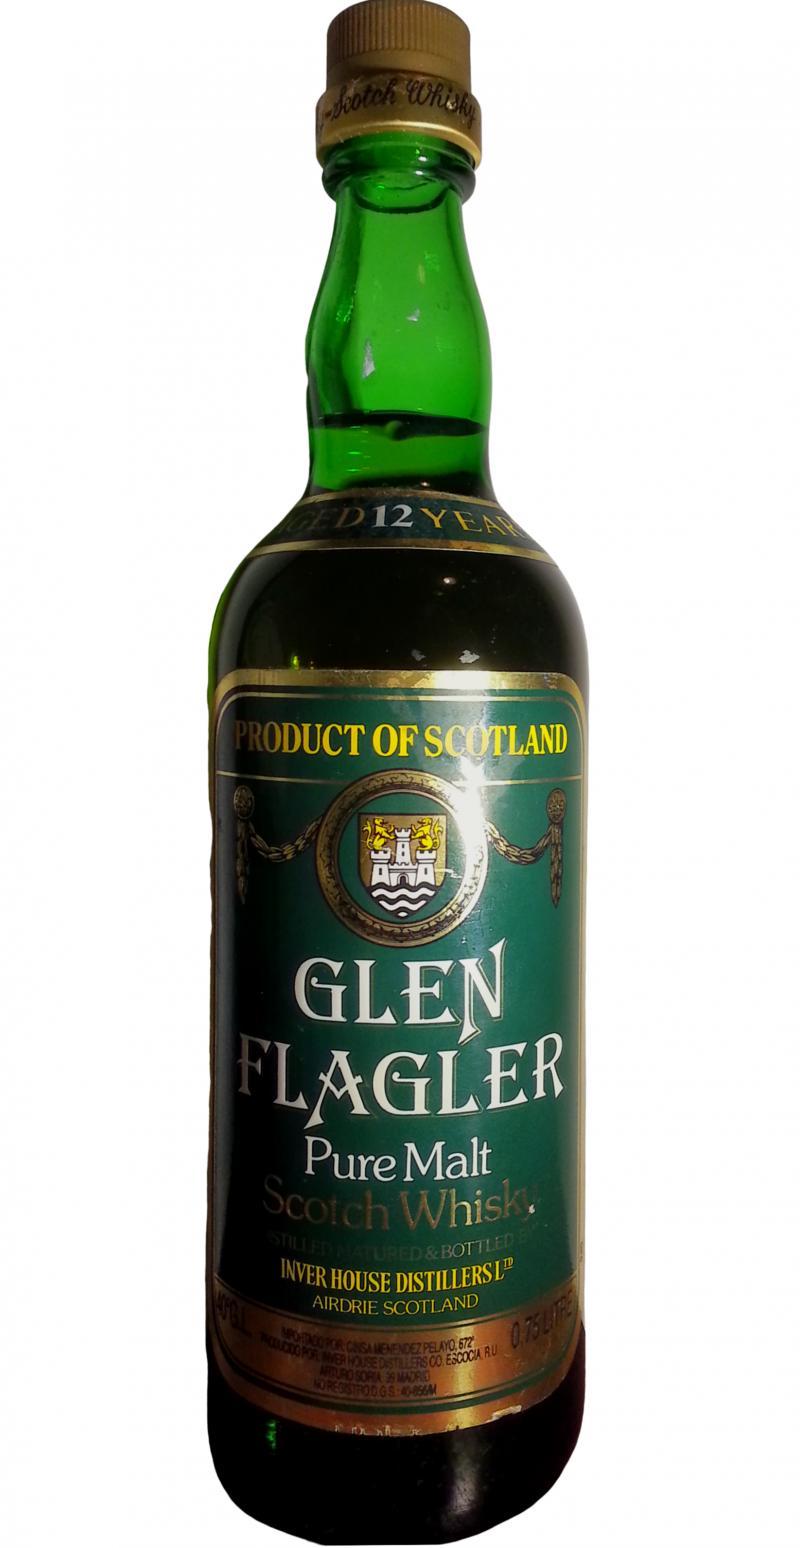 Glen Flagler 12-year-old